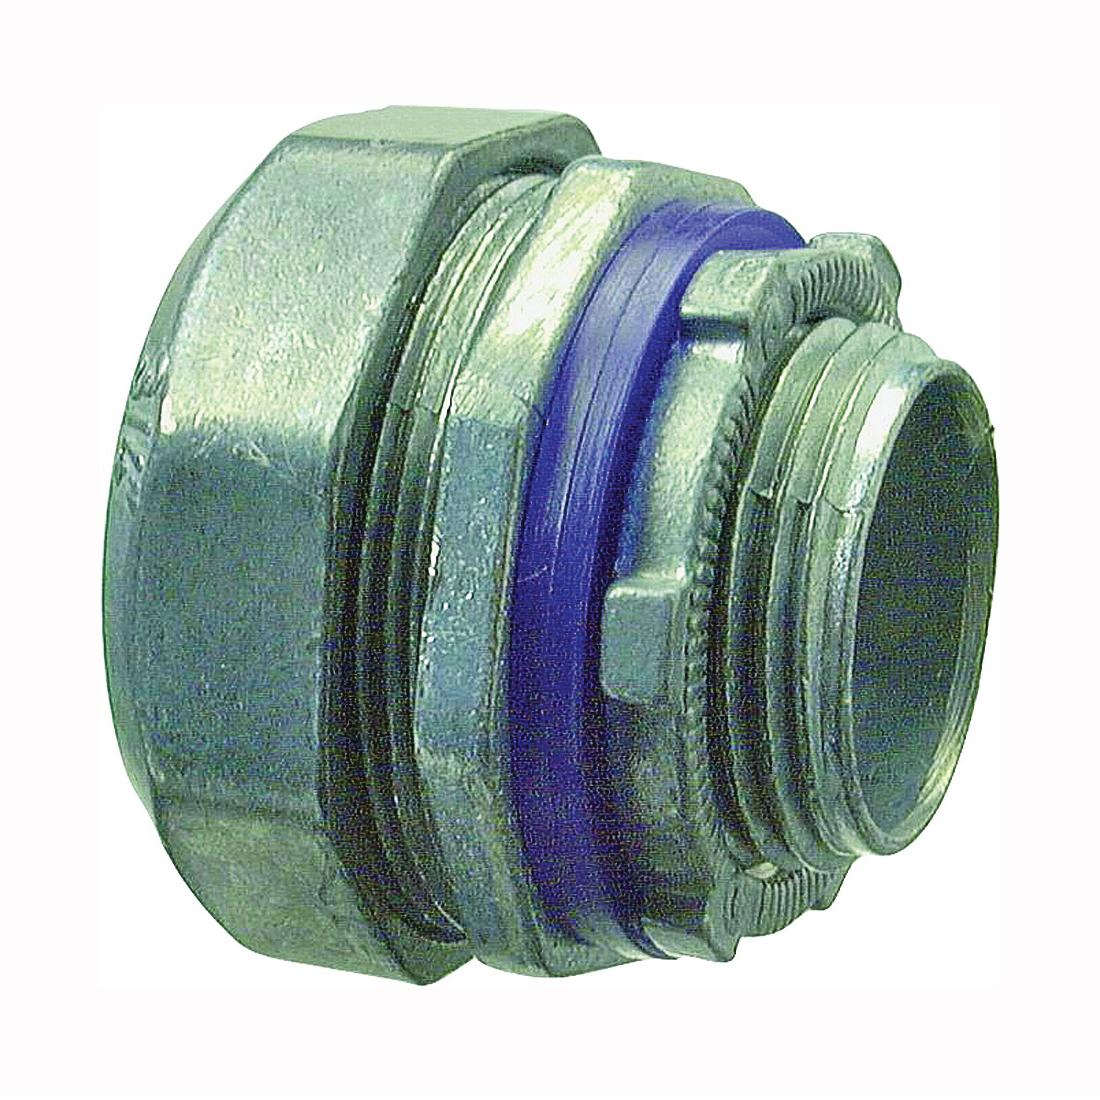 Picture of Halex 16205B Conduit Connector, 1/2 in Trade, Compression, Zinc